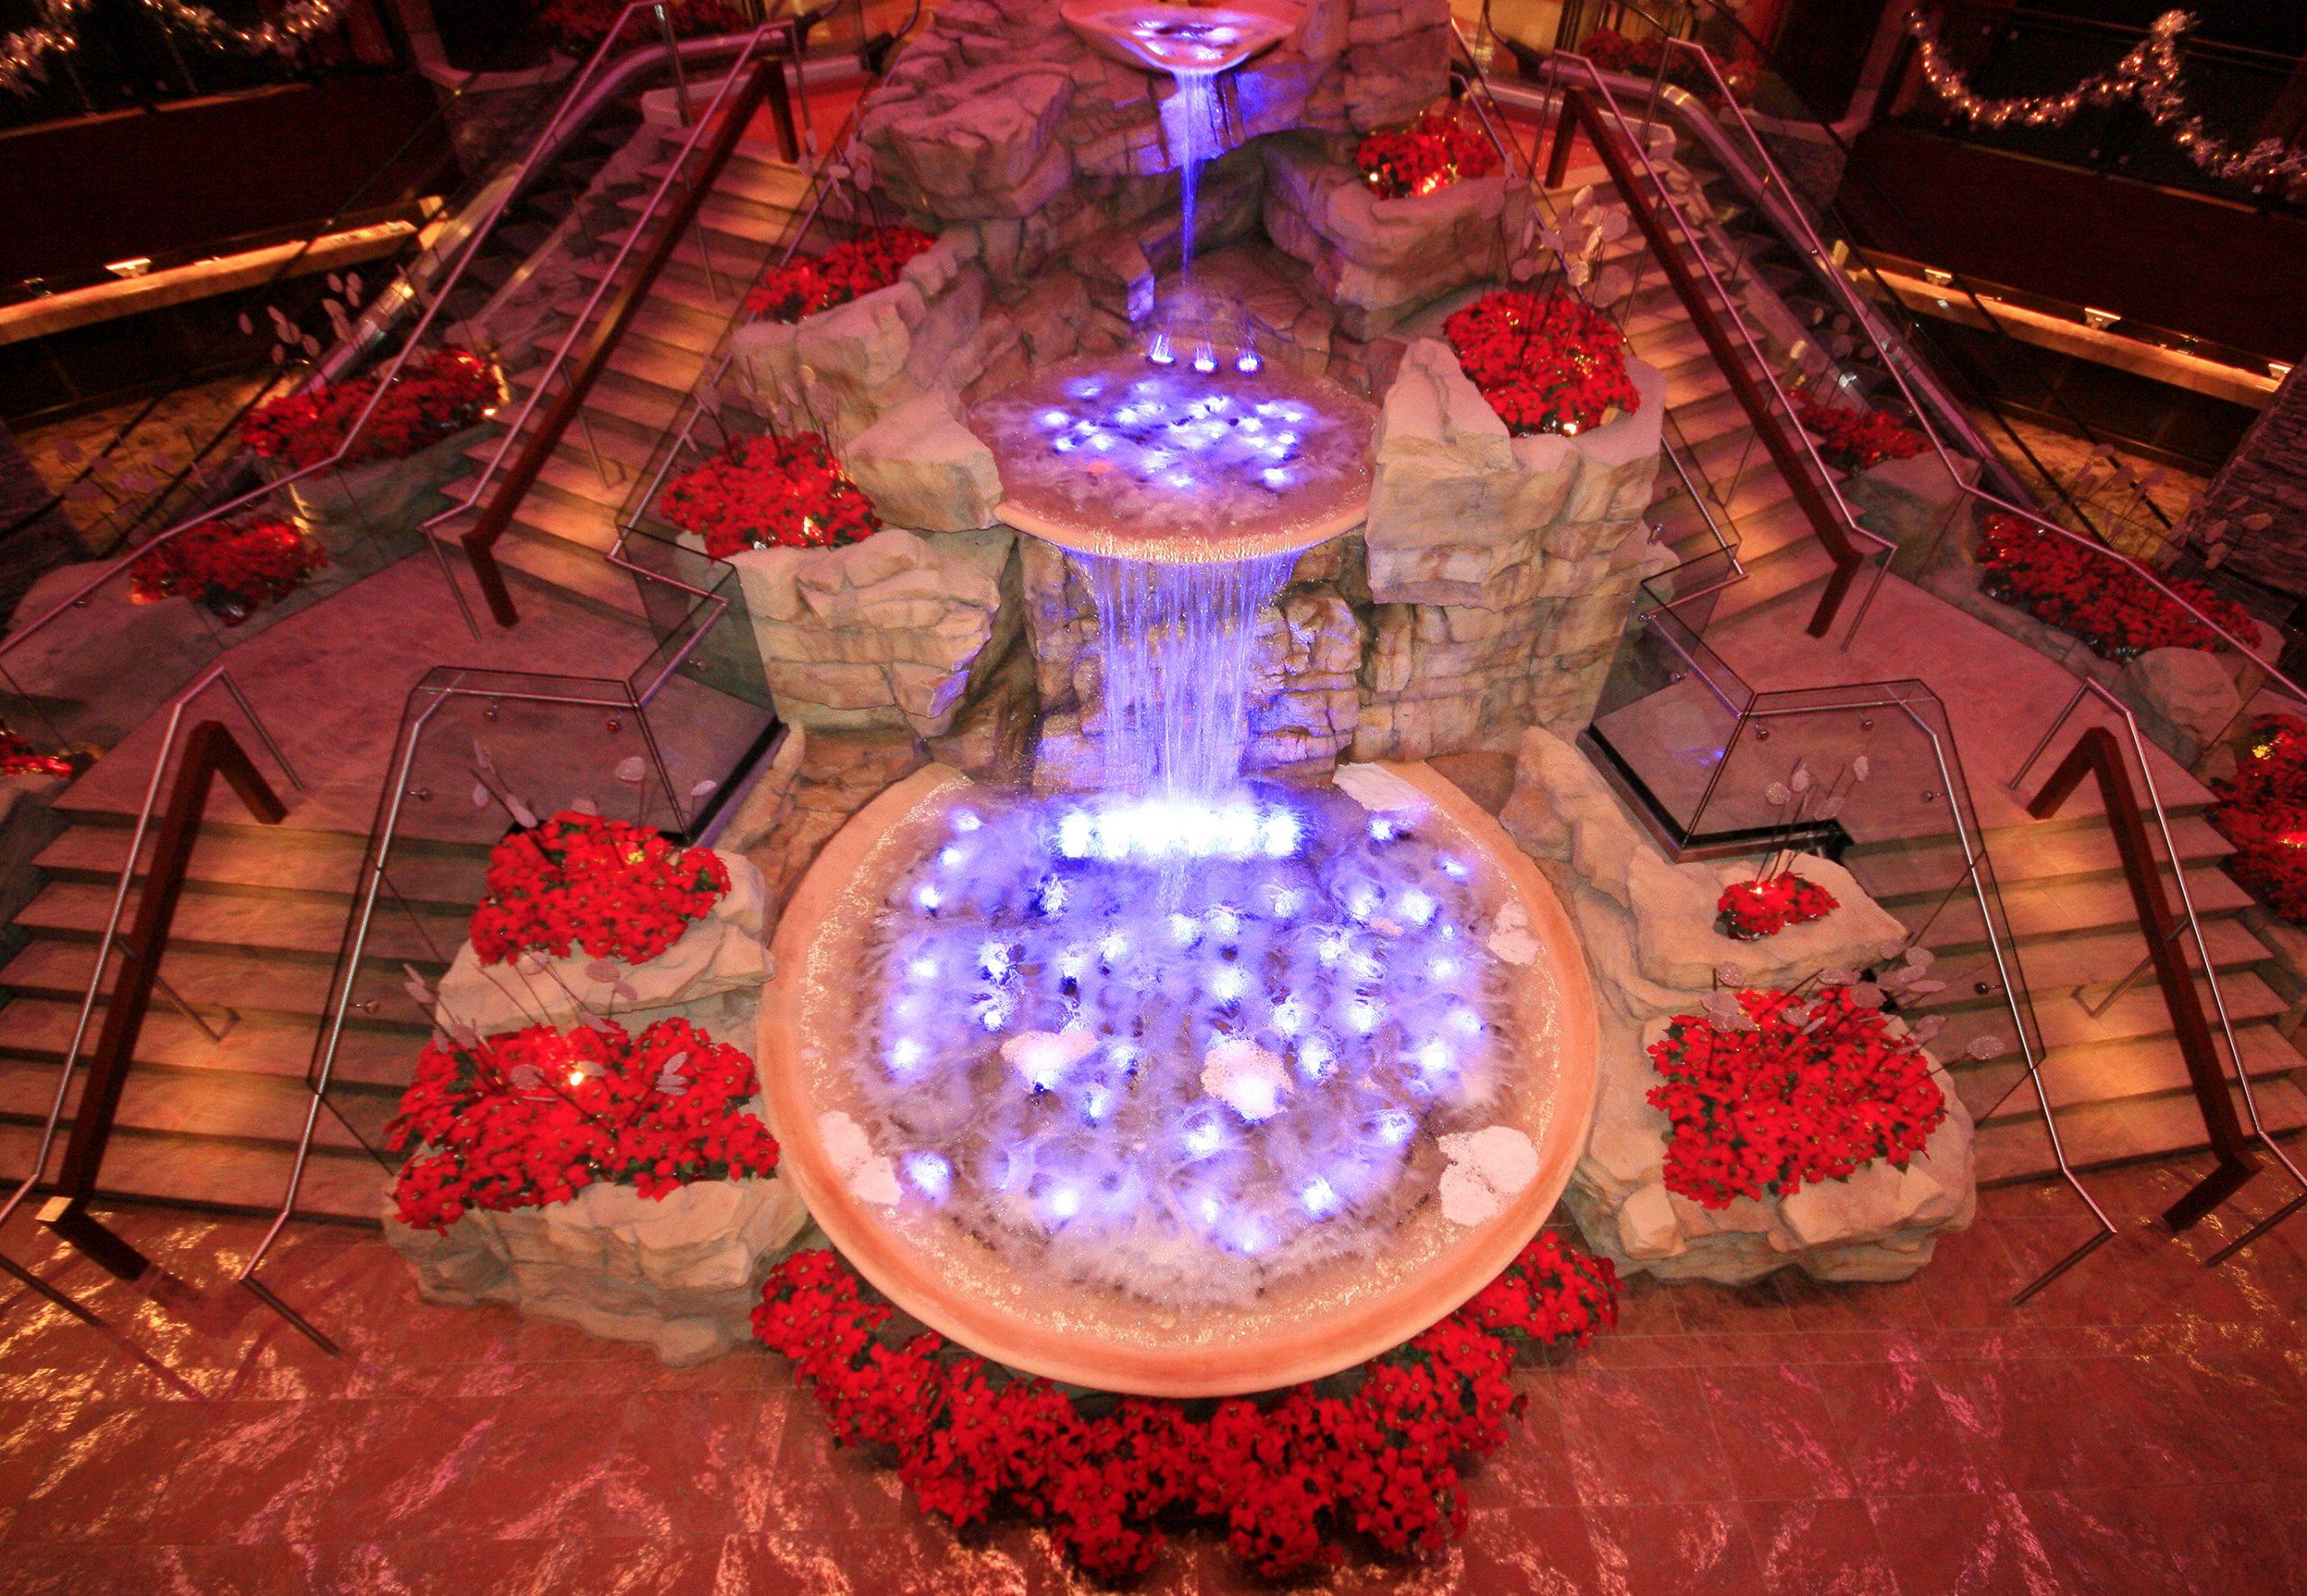 Mount Airy Casino Waterfall fountain